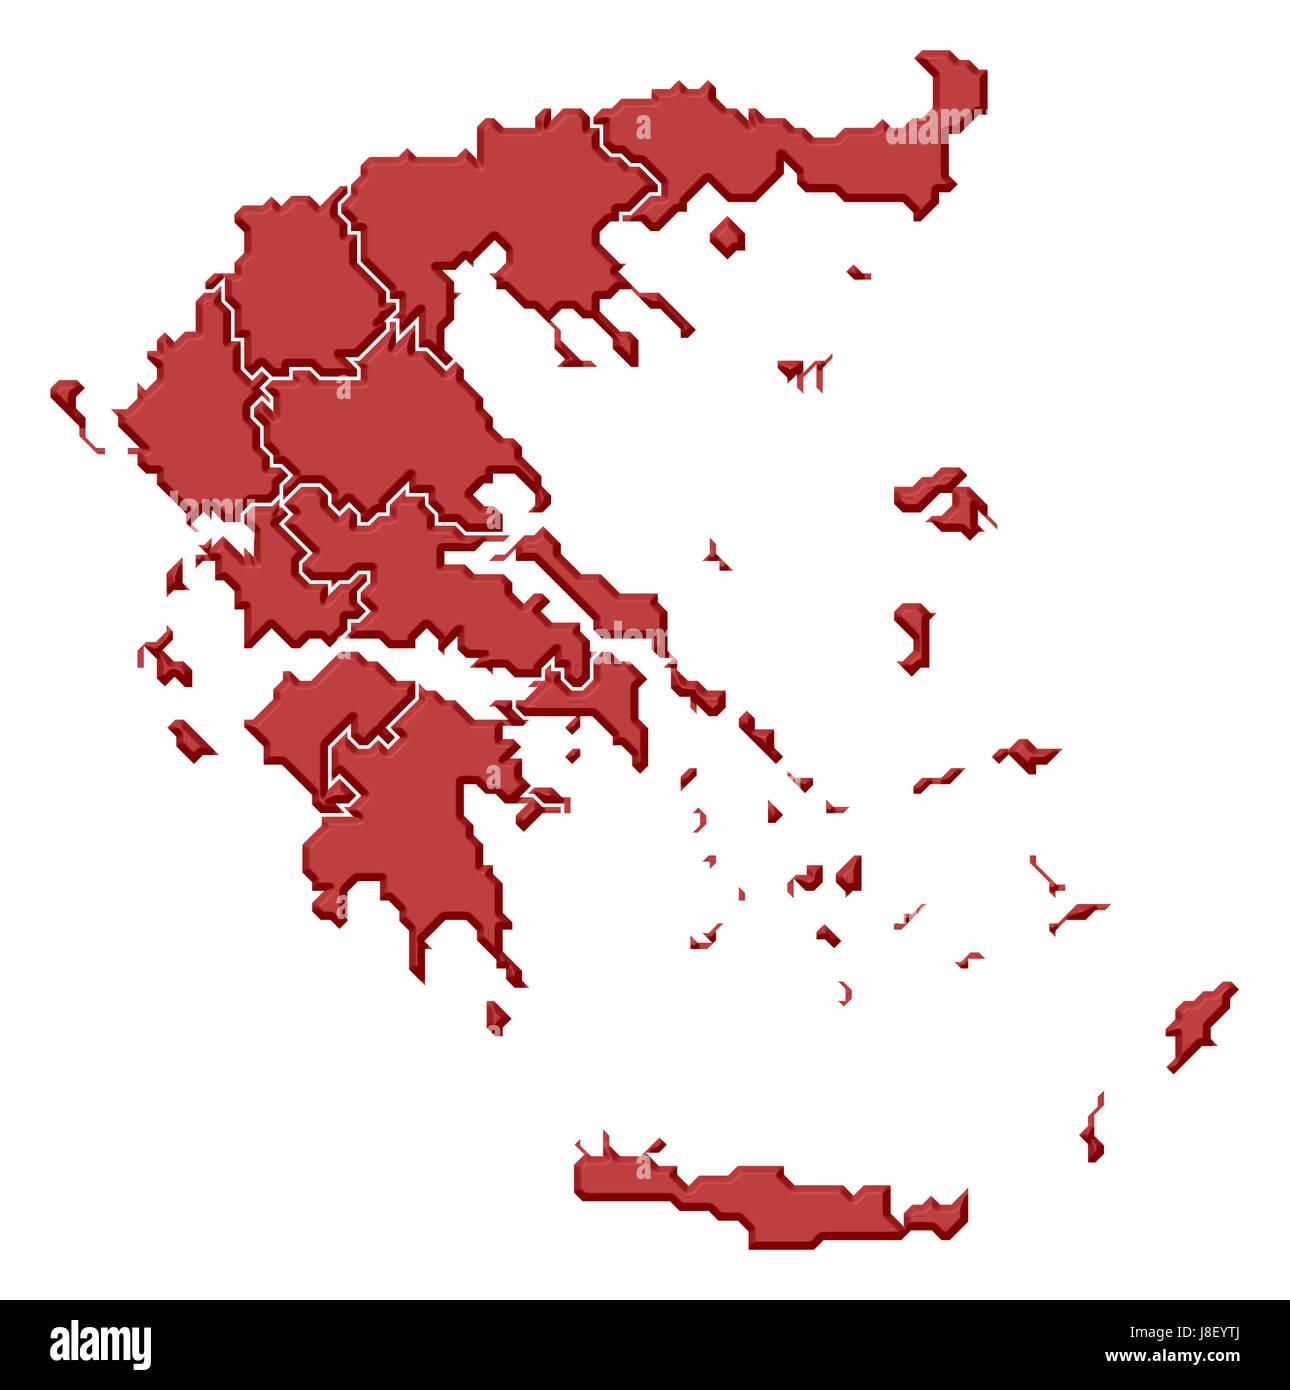 greece, map, atlas, map of the world, profile, symbolic ...